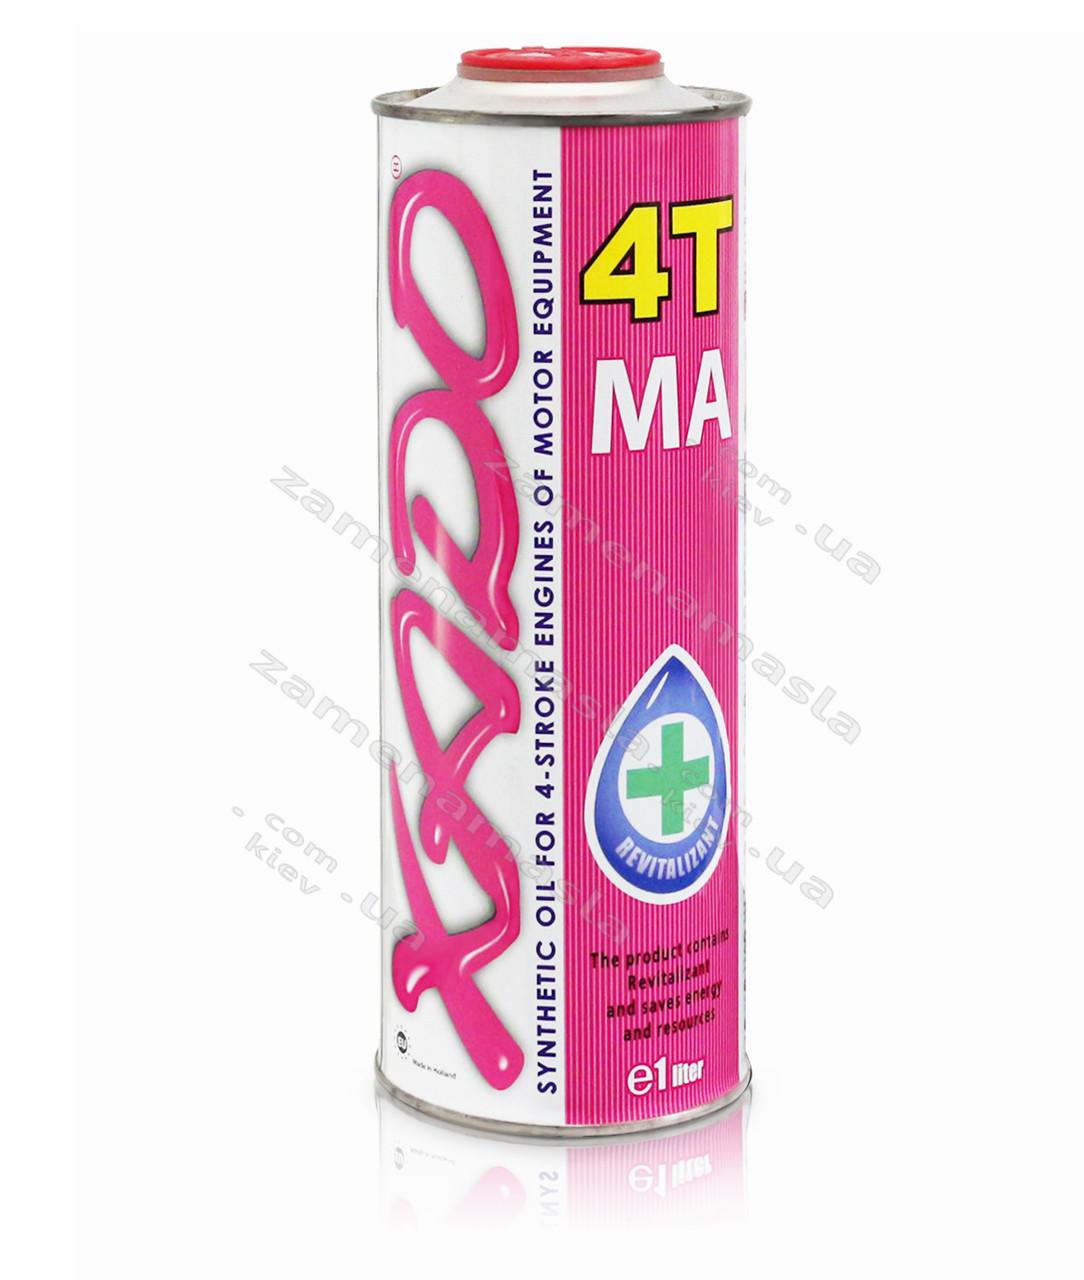 XADO Atomic Oil 10W-60 4Т MA 1л(мото-тех.) - моторное масло